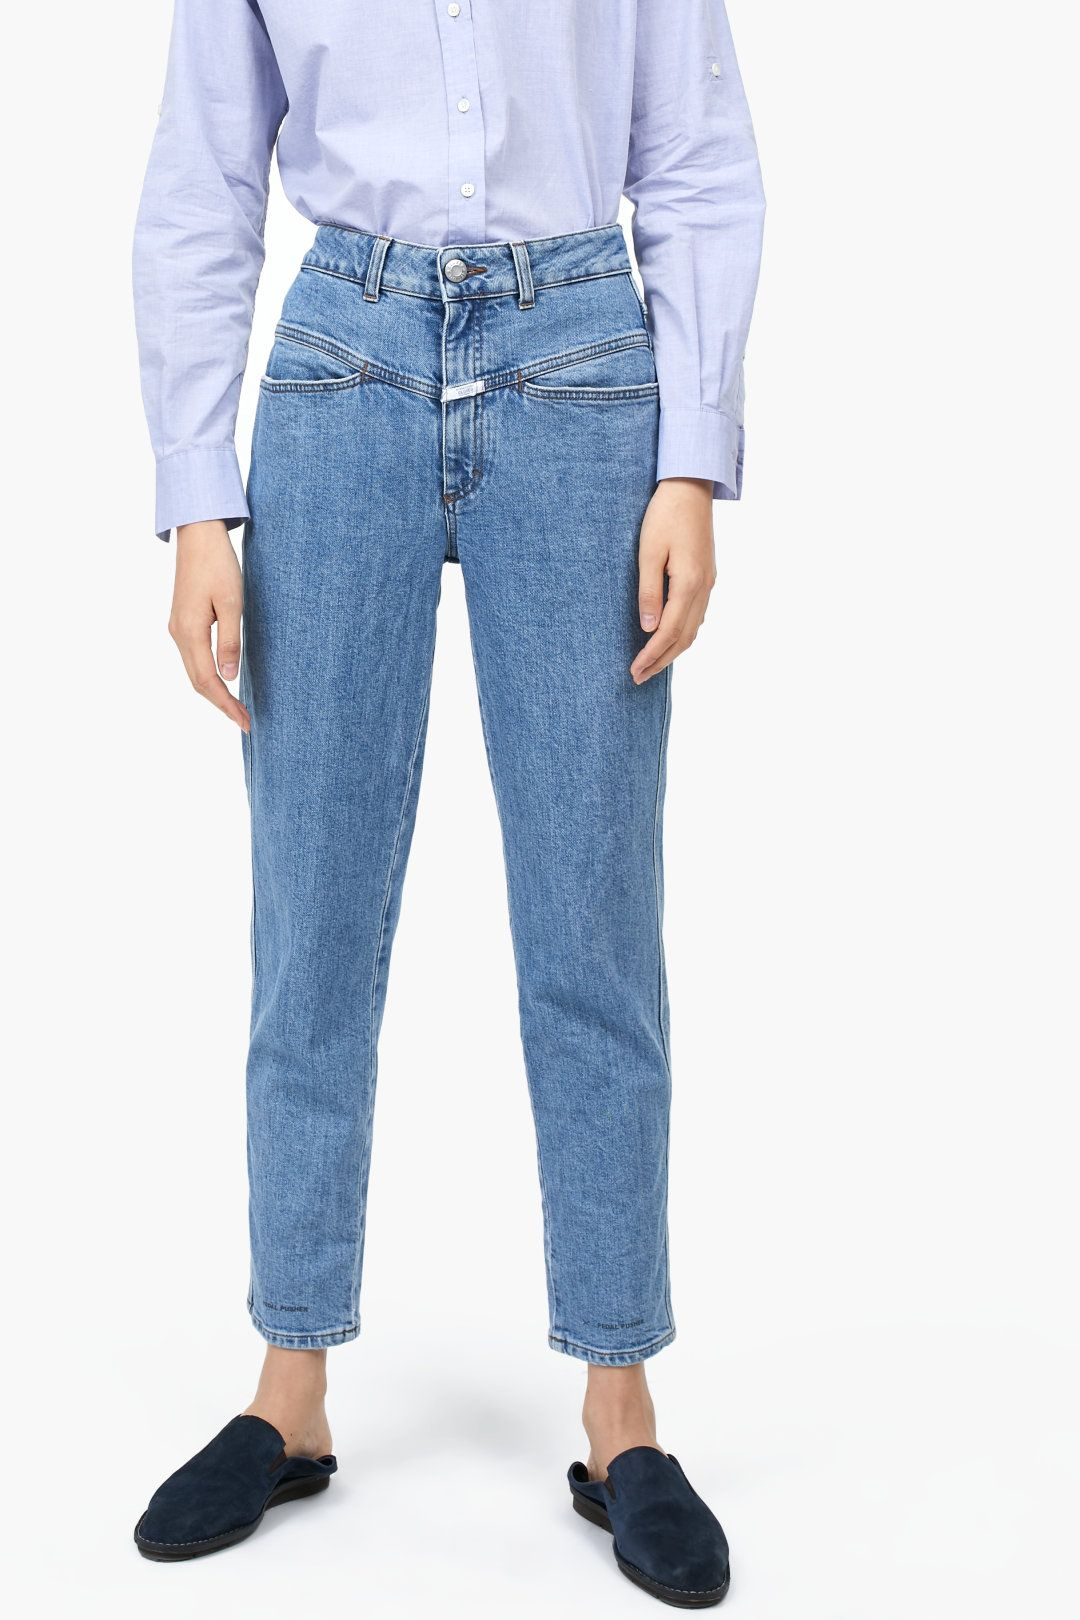 73e6ec2b18 Pedal Pusher Authentic Blue Stretch Denim   Shopping Cart   Jeans ...